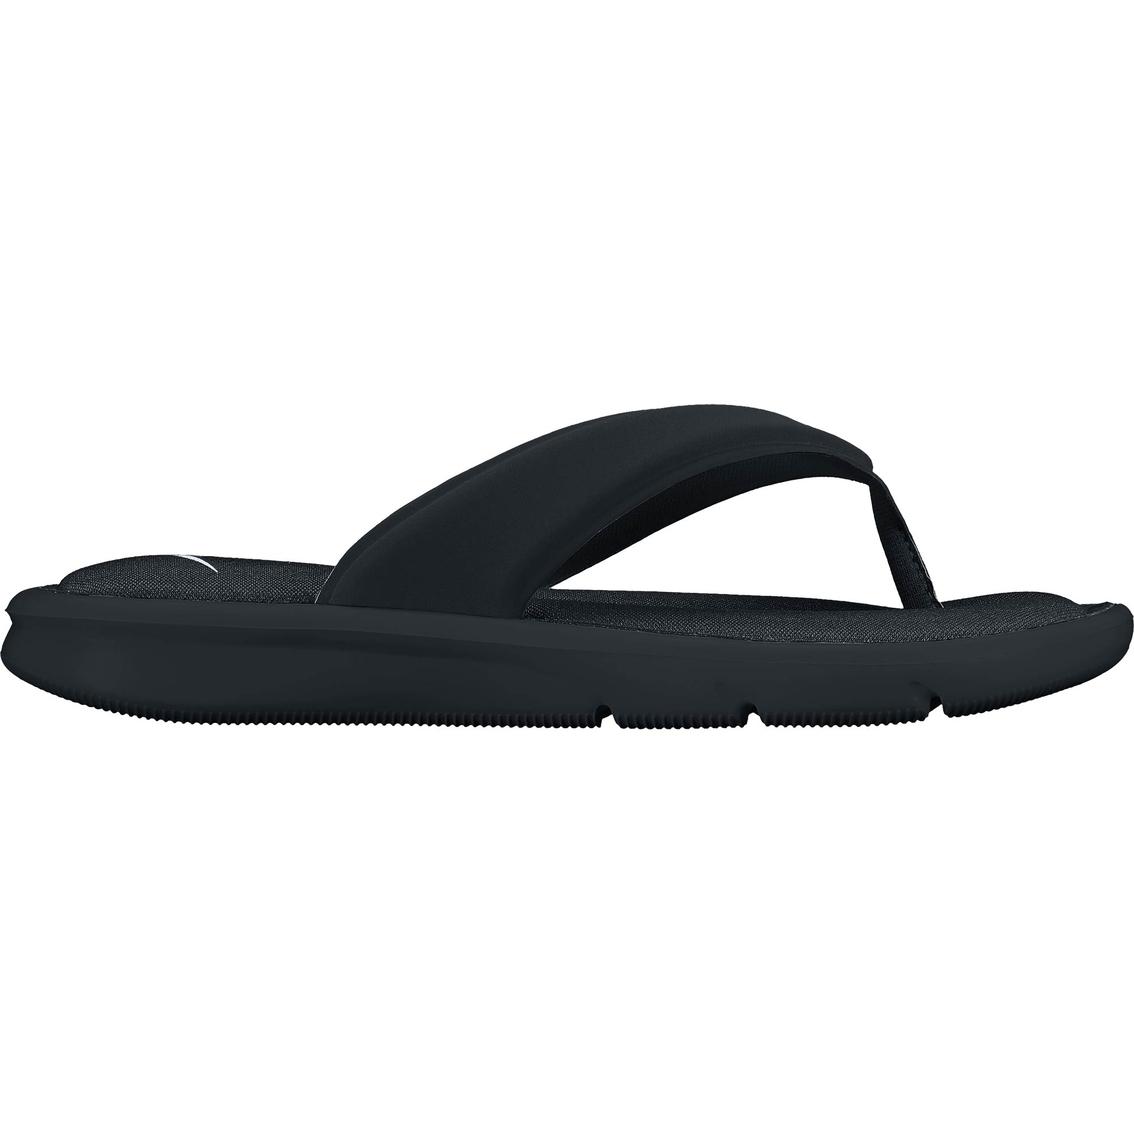 5aac8ba41 Nike Women s Ultra Comfort Thong Sandals